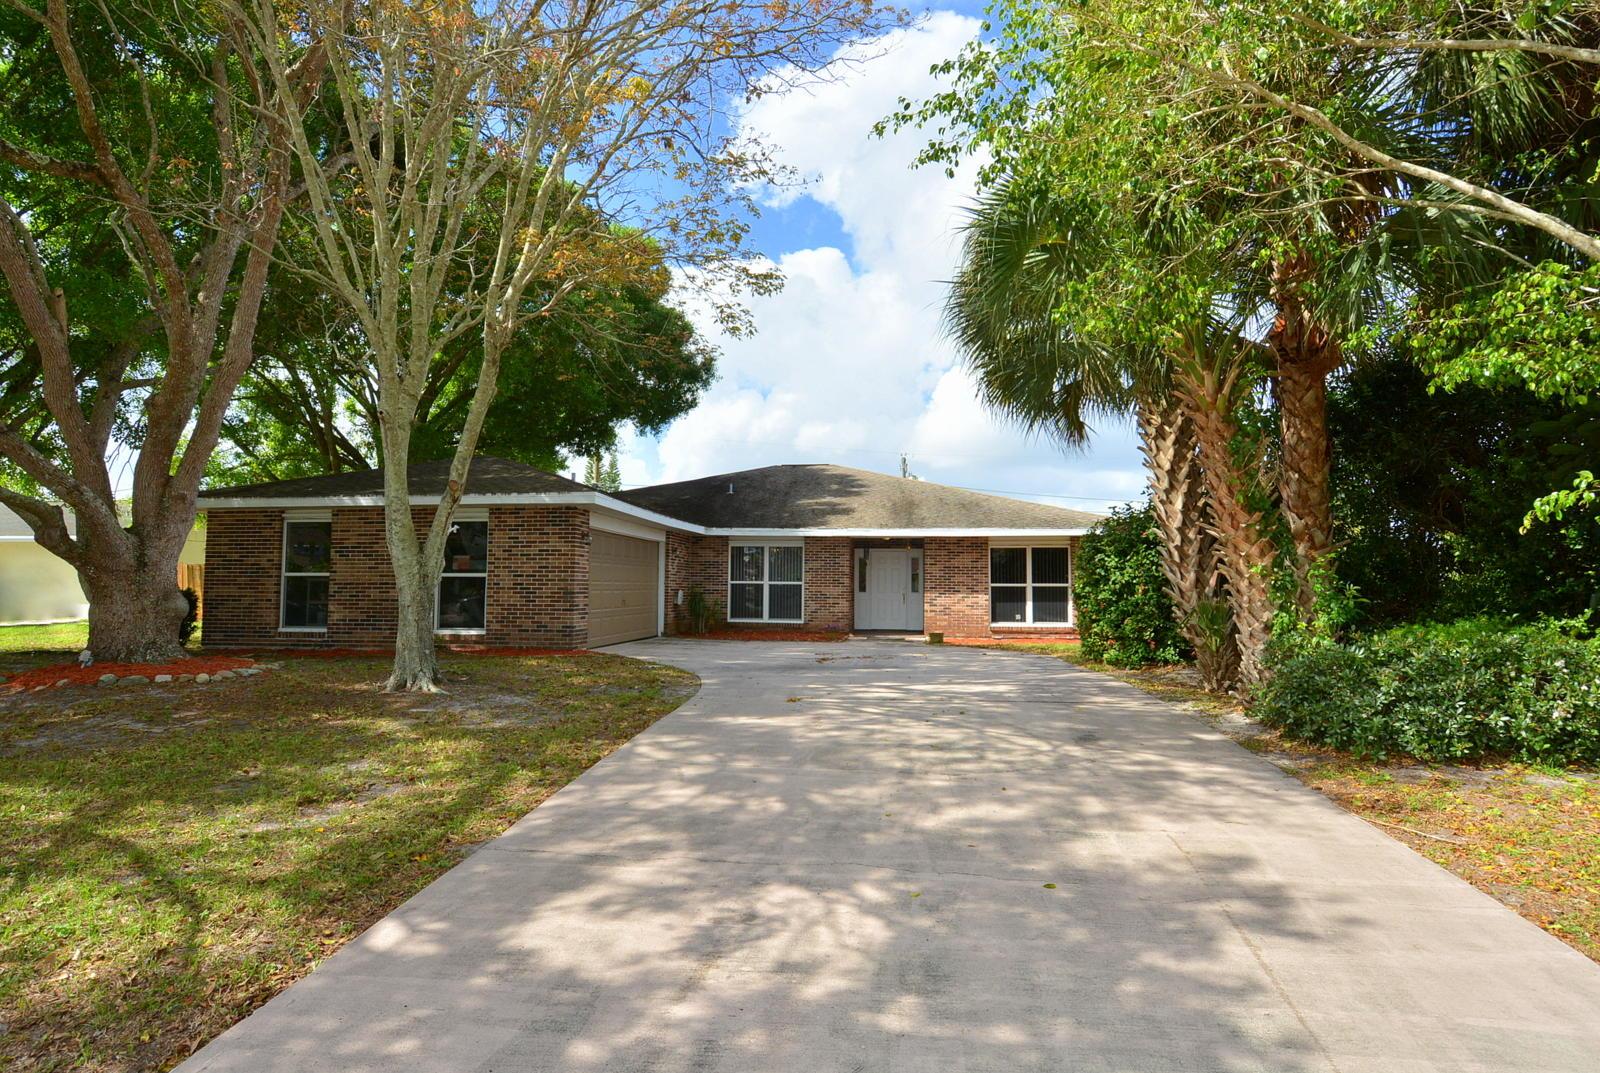 149 NE Caprona Avenue - Port St Lucie, Florida